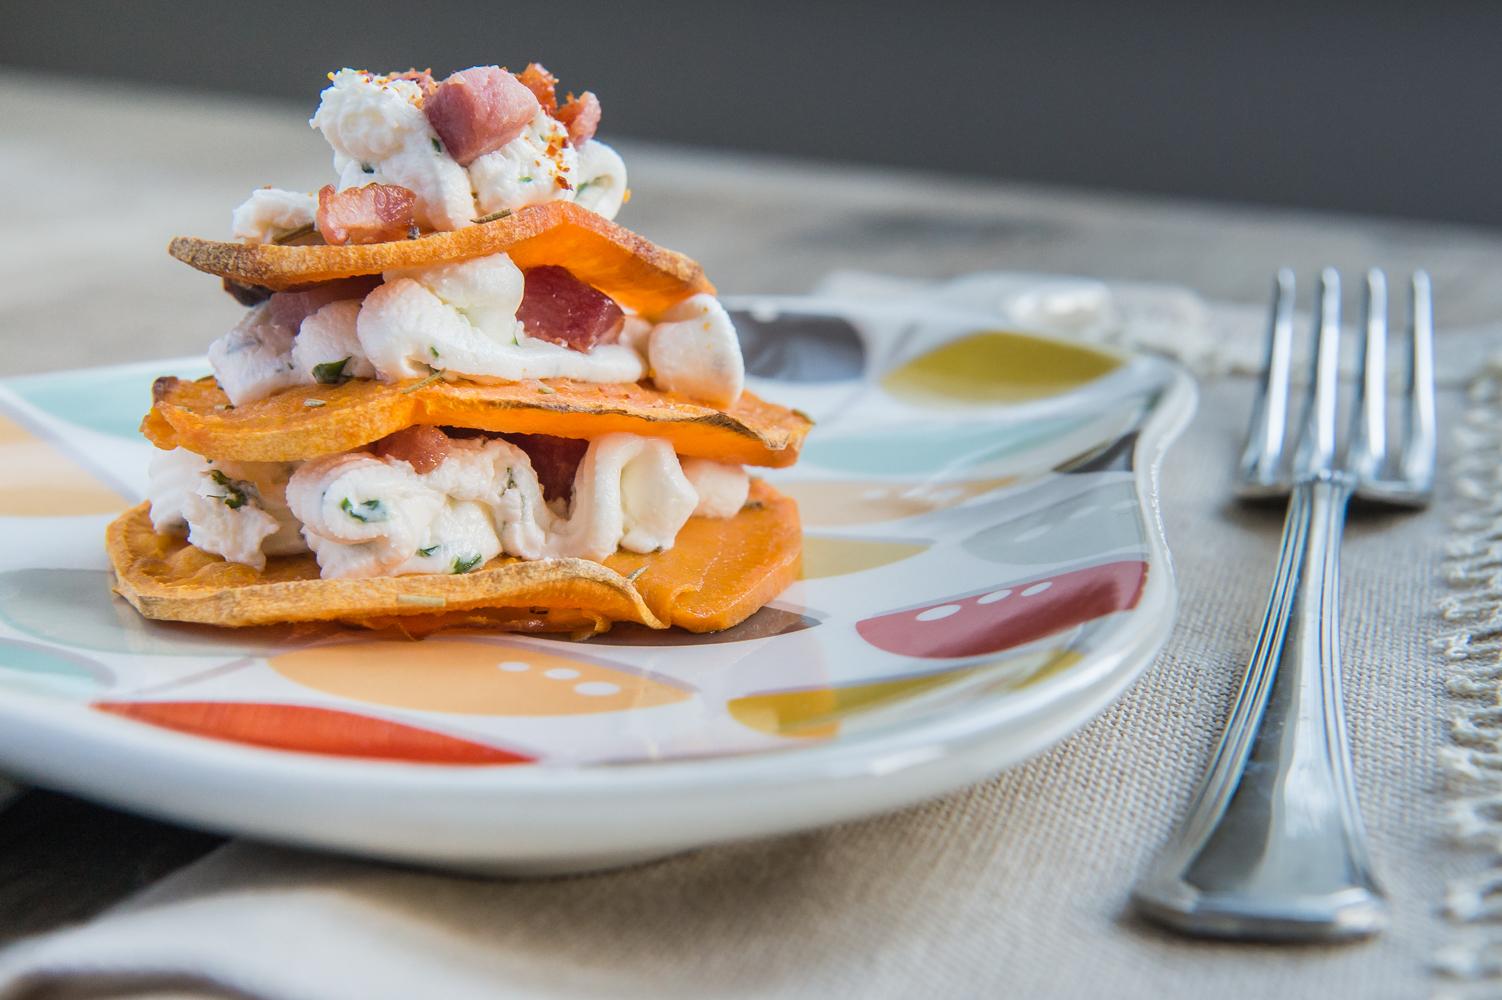 Torre di patate dolci, formaggio fresco e pancetta affumicata